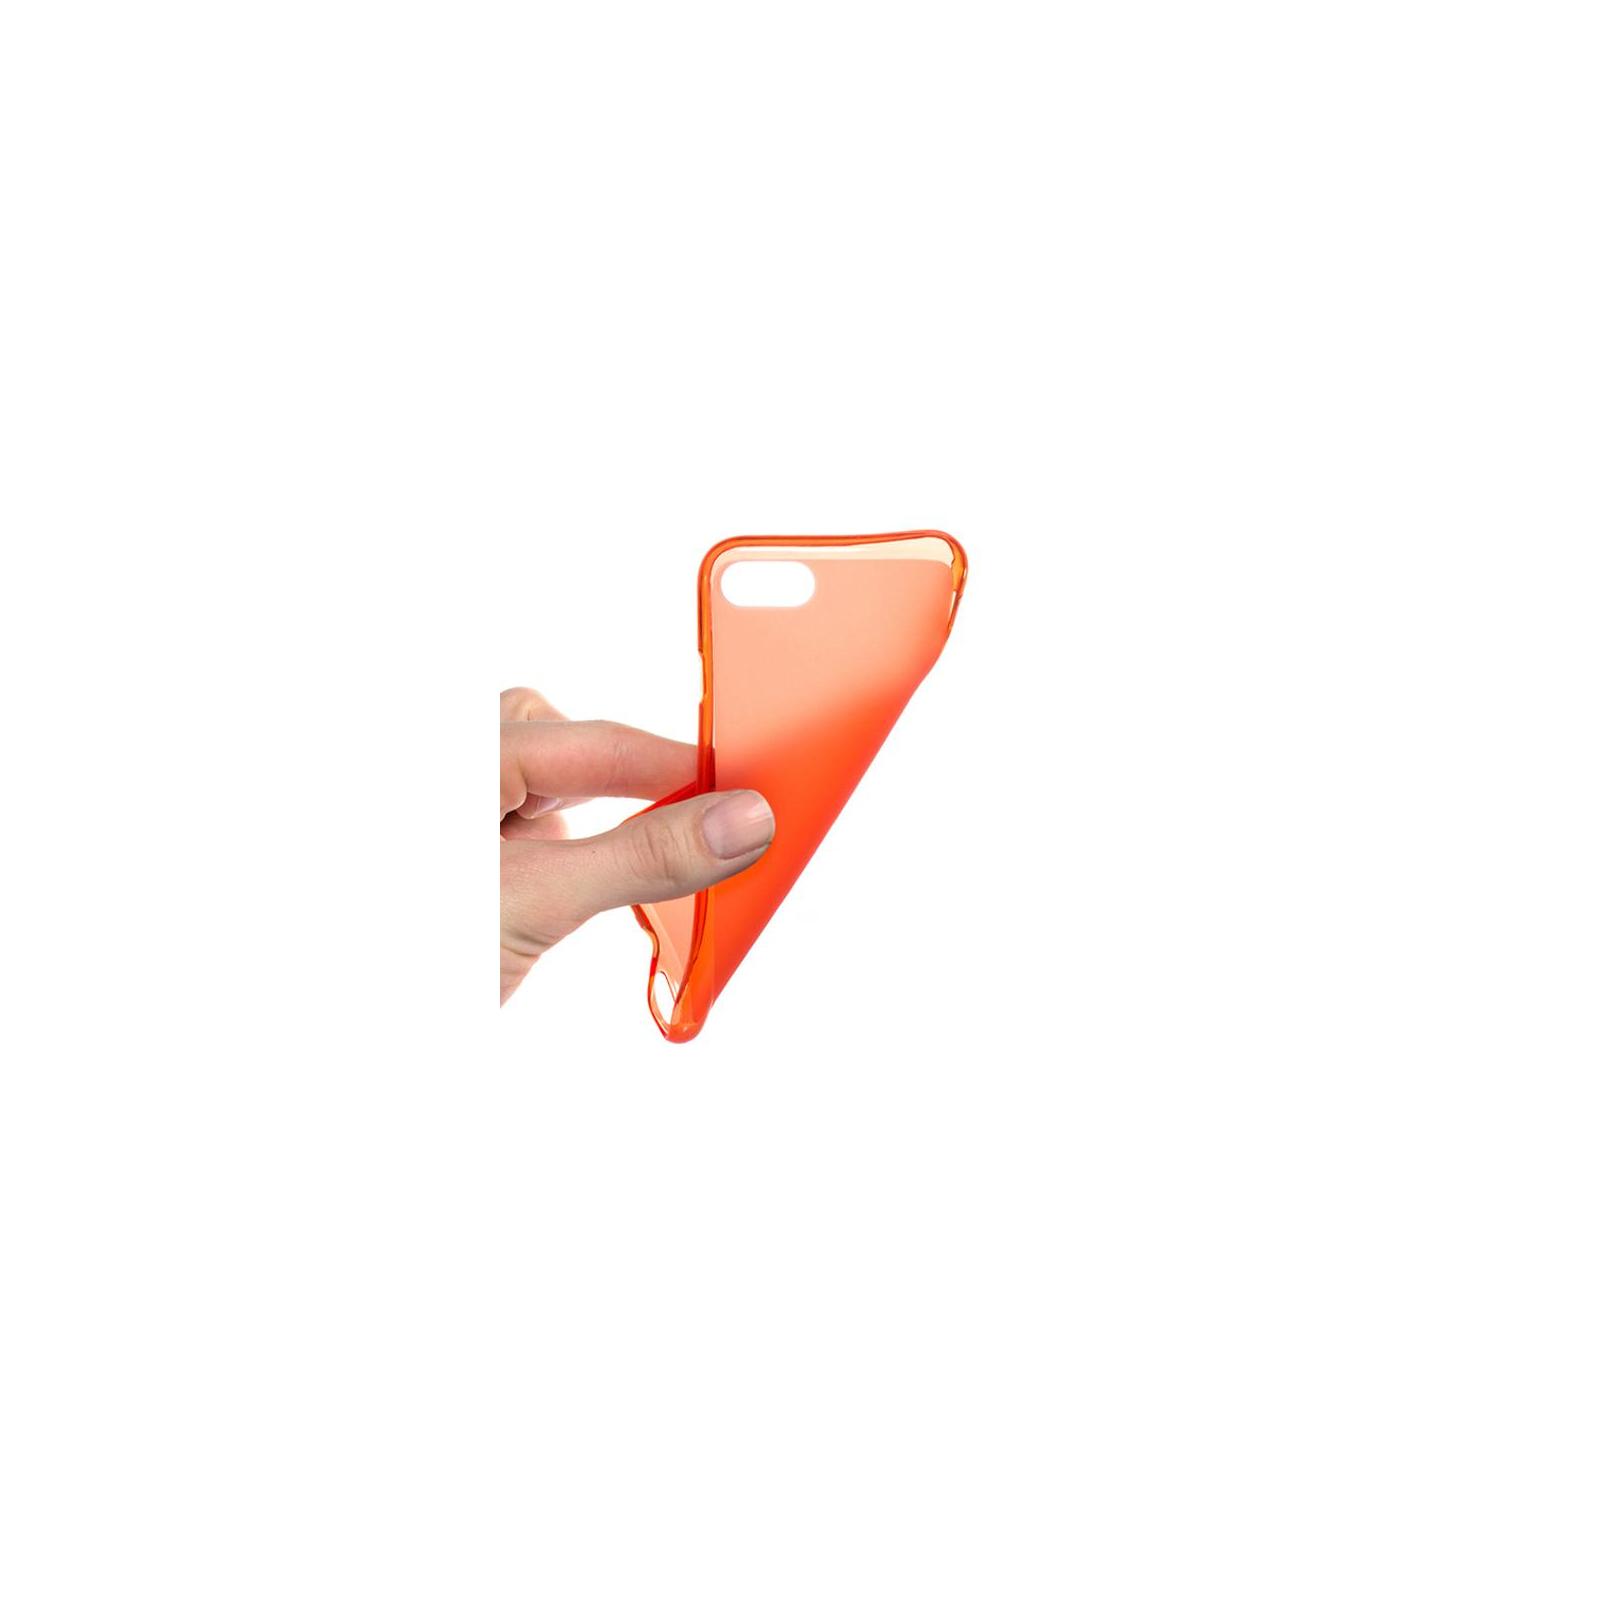 Чехол для моб. телефона Colorway TPU case for Apple iPhone 7/8, red (CW-CTPAI7-RD) изображение 3